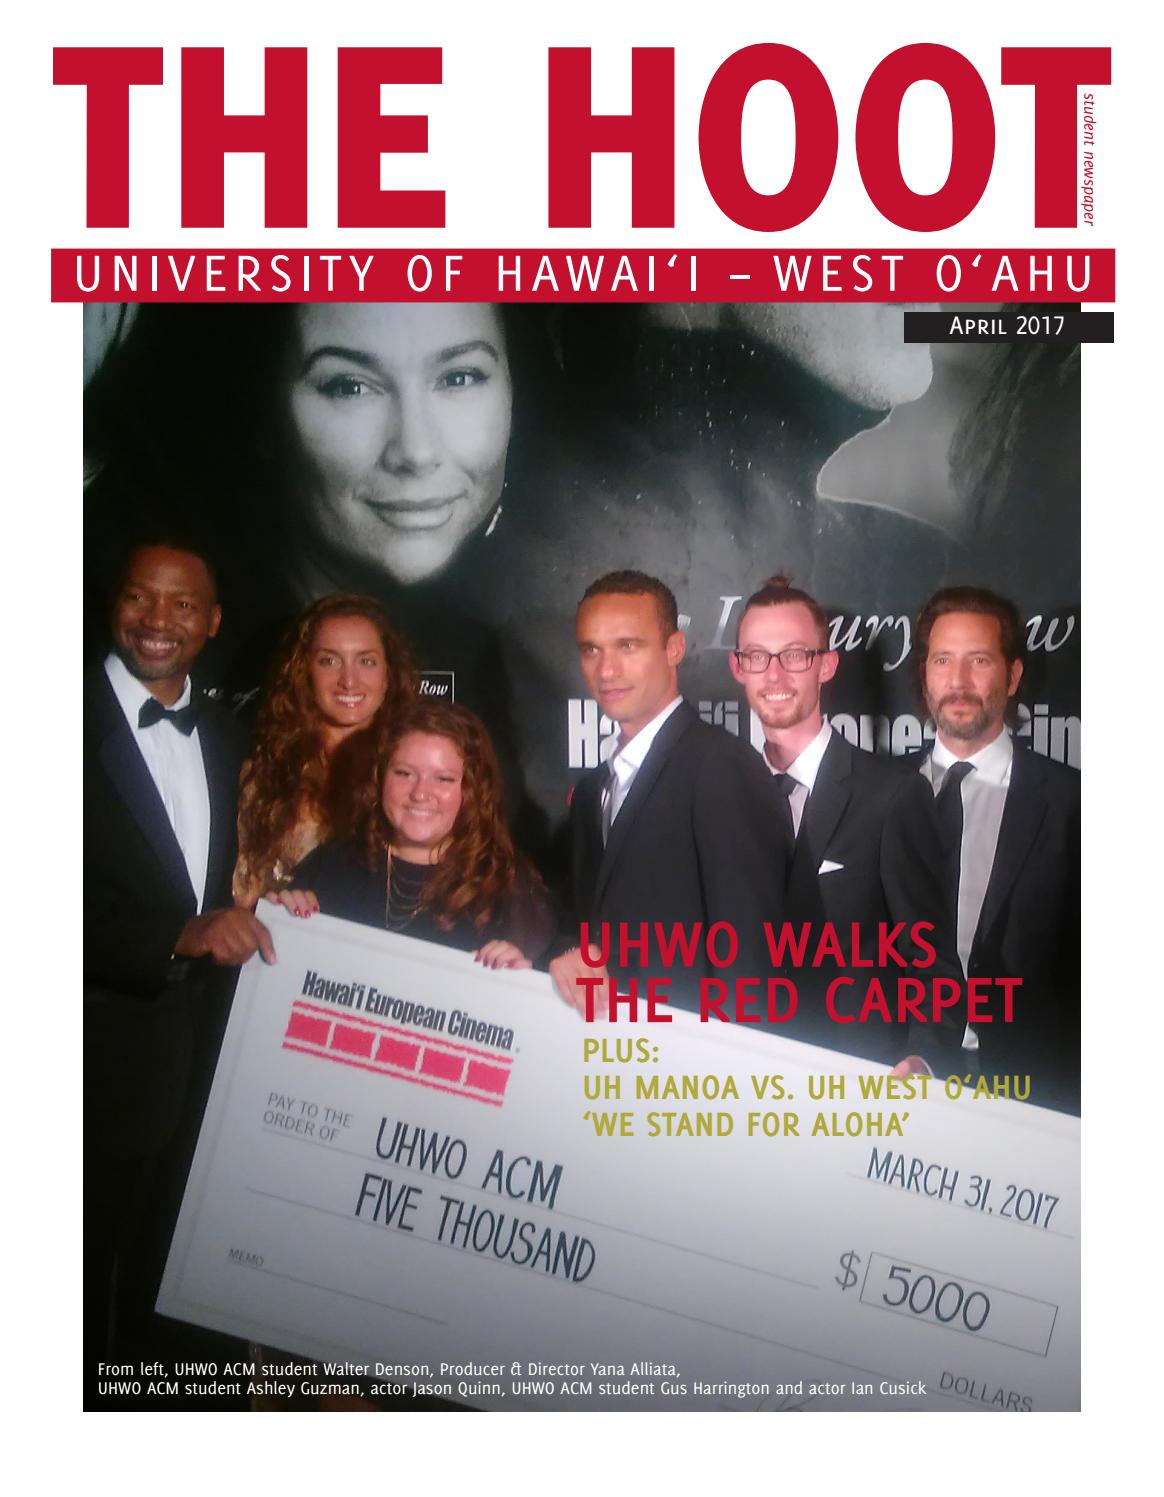 UHWO The Hoot Issue #36 by UHWO The Hoot - issuu